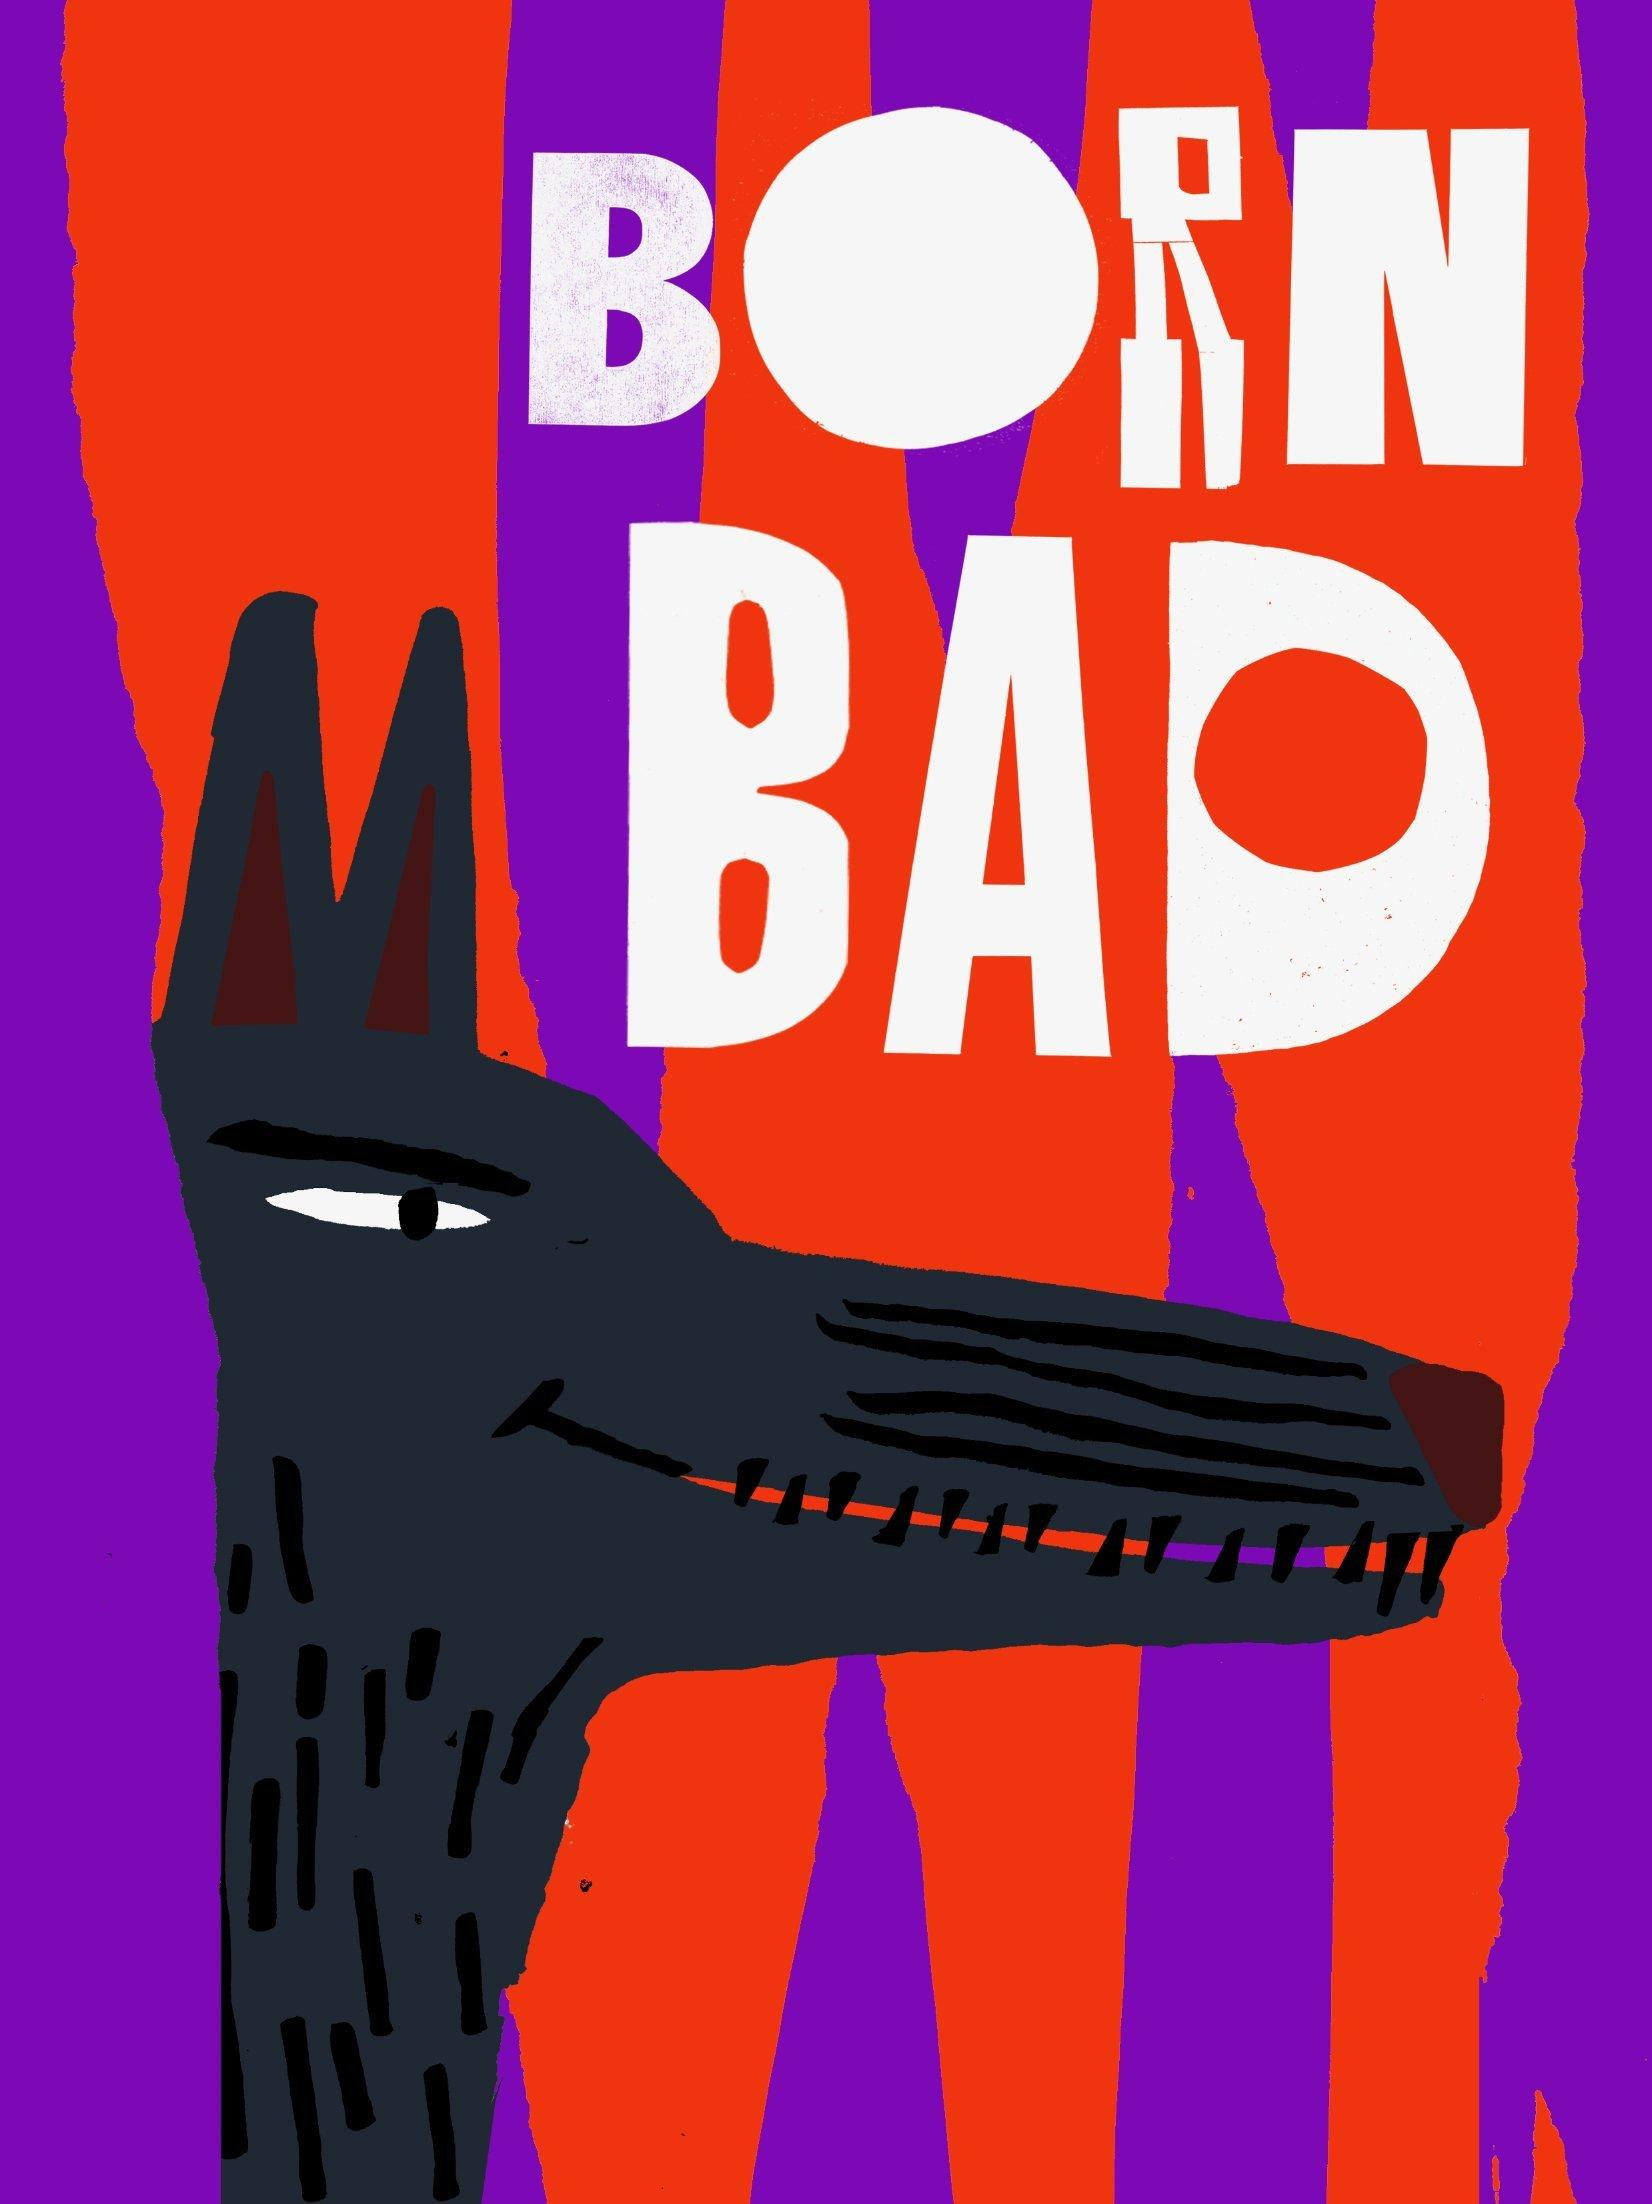 BornBad